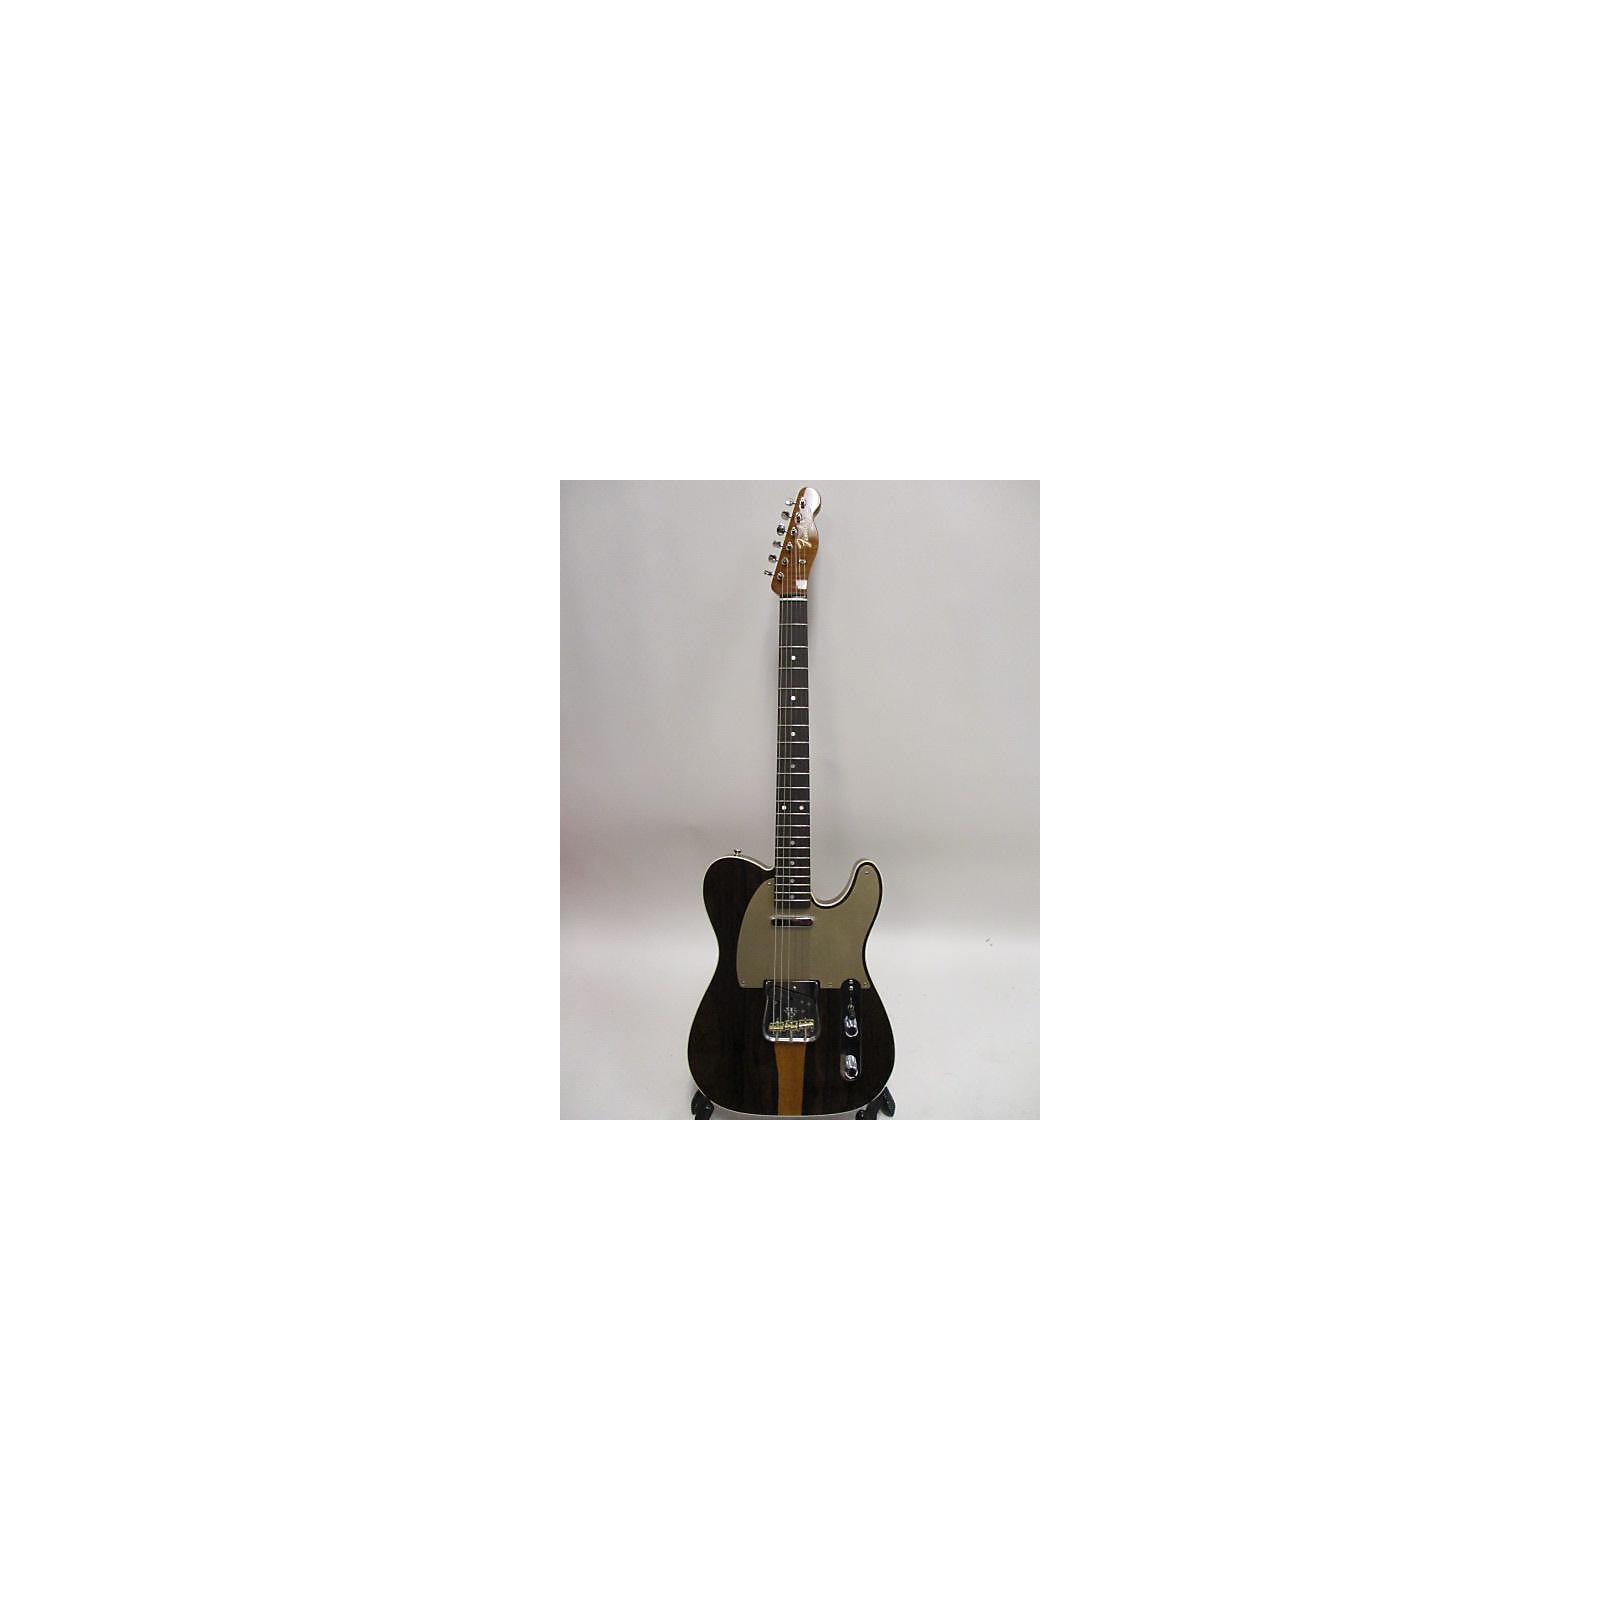 Fender 2018 Custom Shop Artisan Ziricote Telecaster Solid Body Electric Guitar